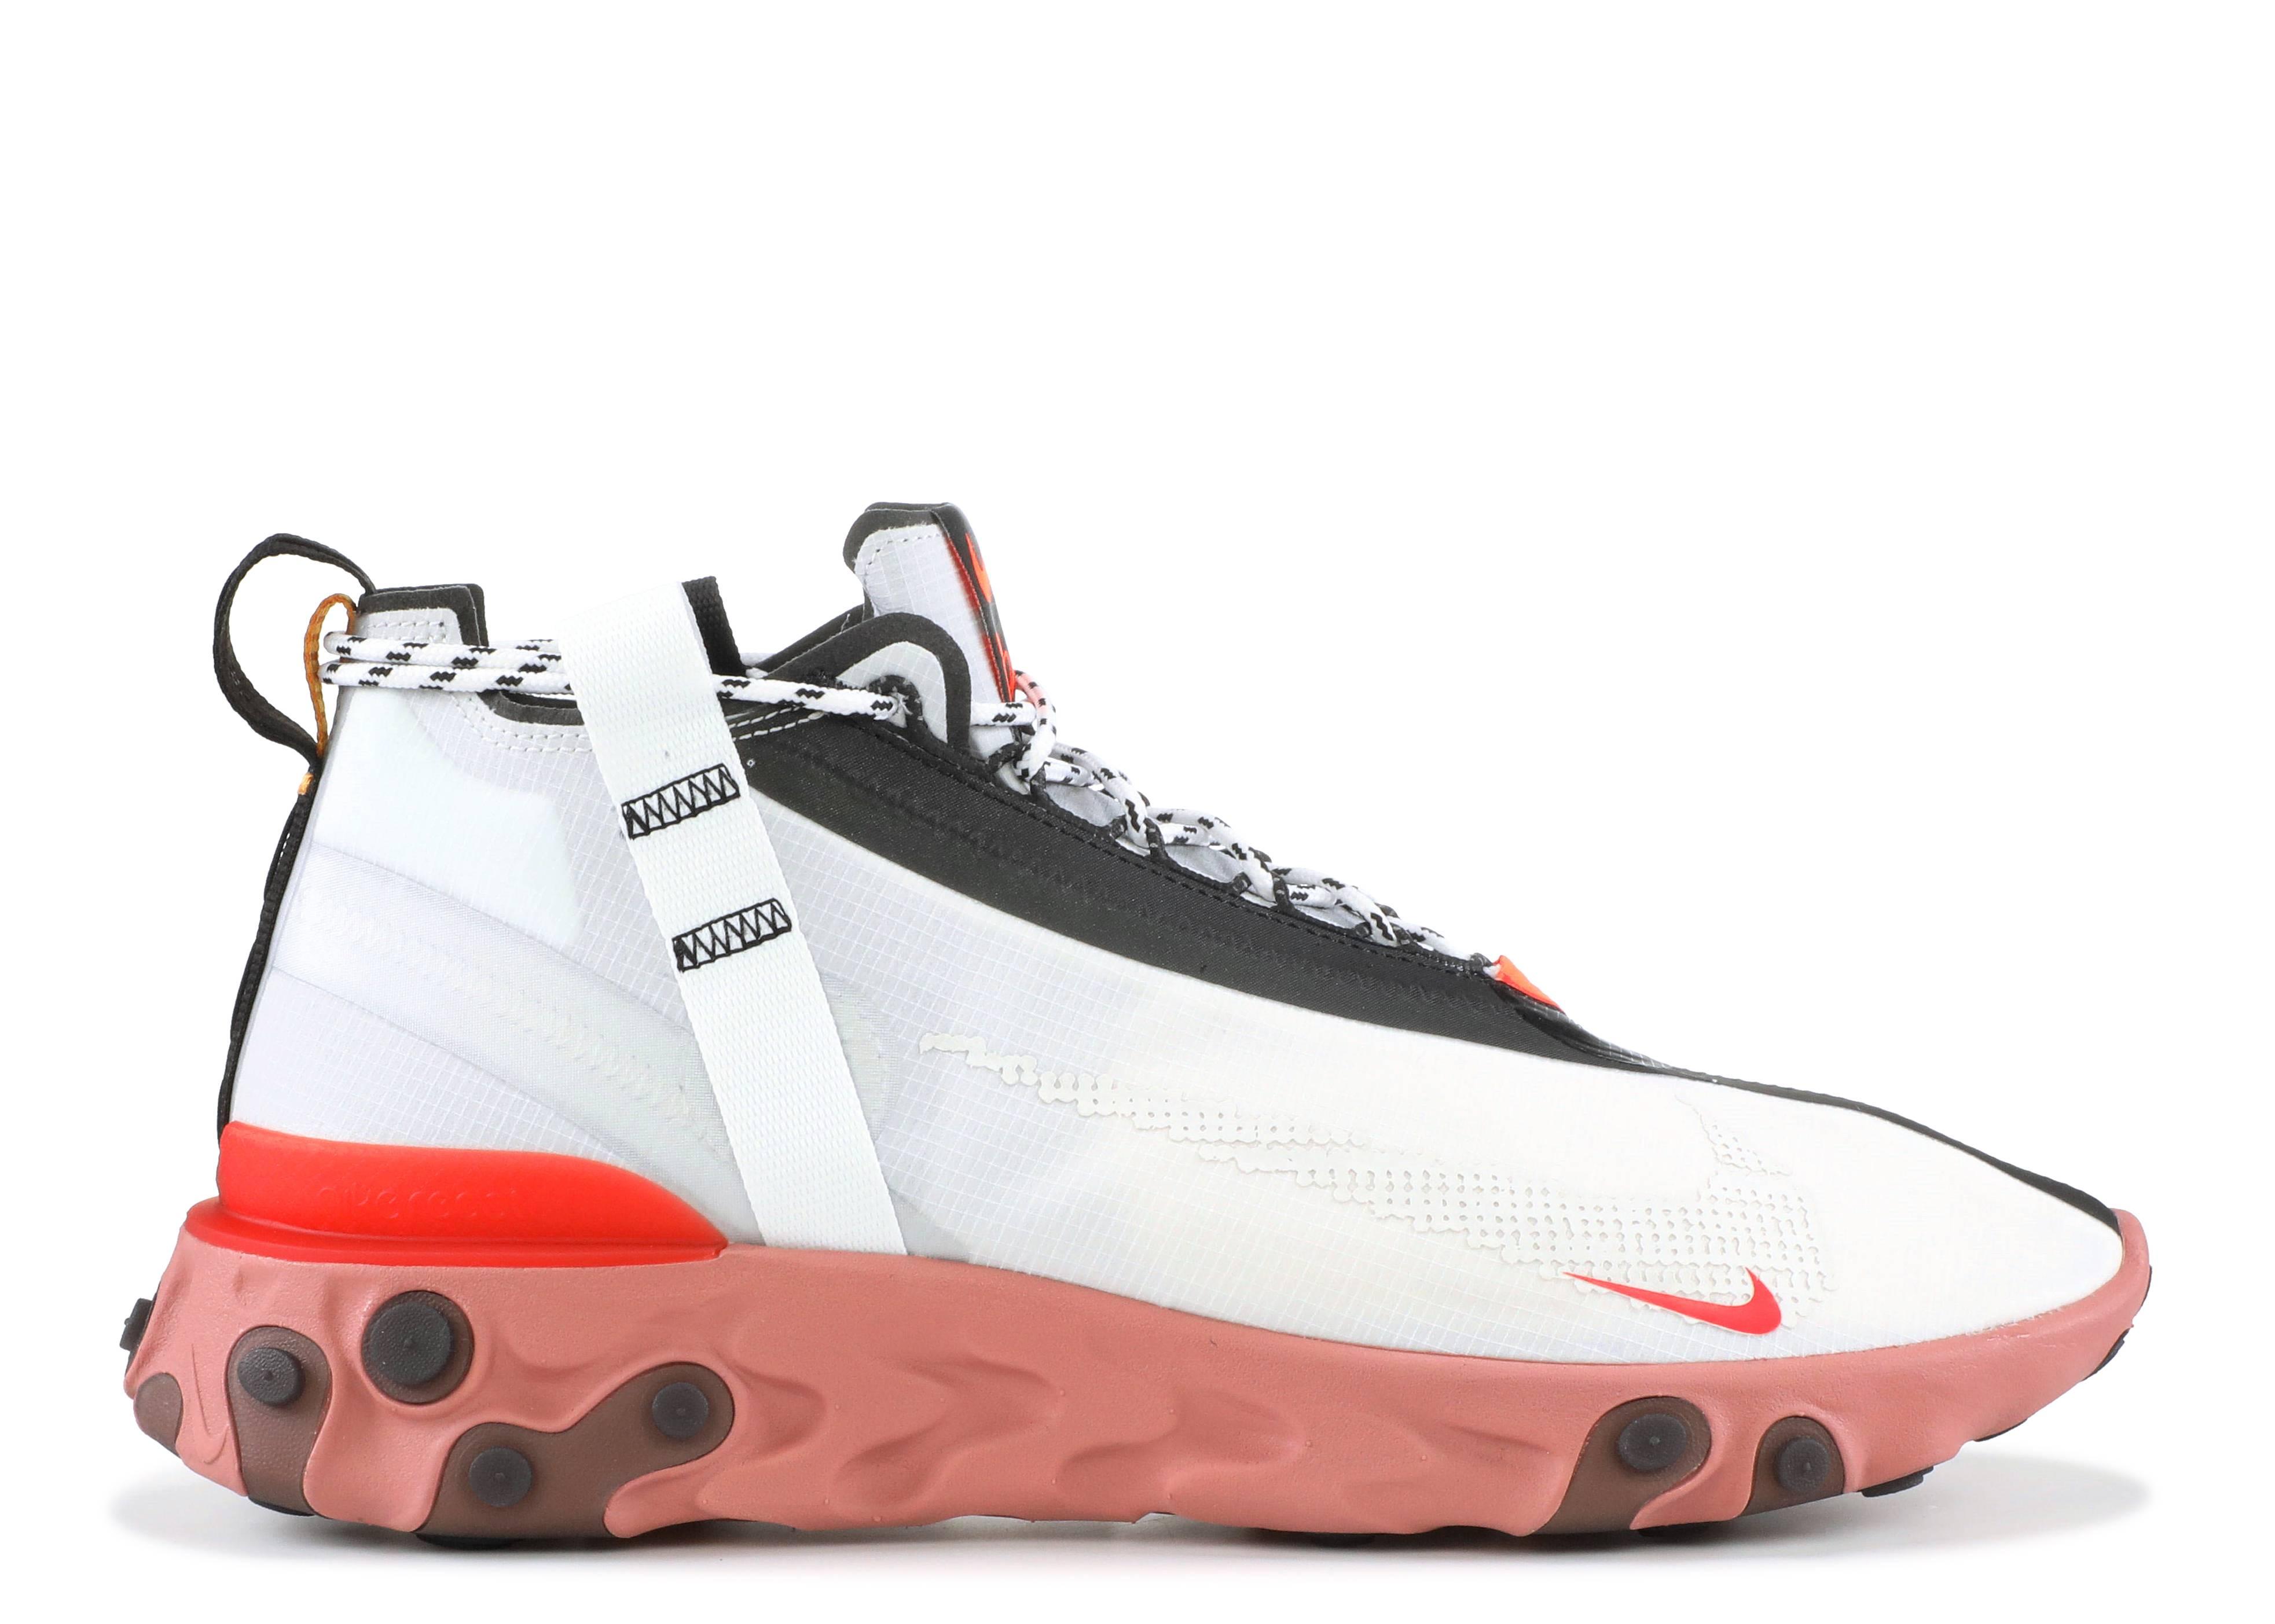 Poliziotto toppa ingegneria  React Runner Mid WR ISPA 'Summit White' - Nike - AT3143 100 - summit  white/off white-light crimson | Flight Club